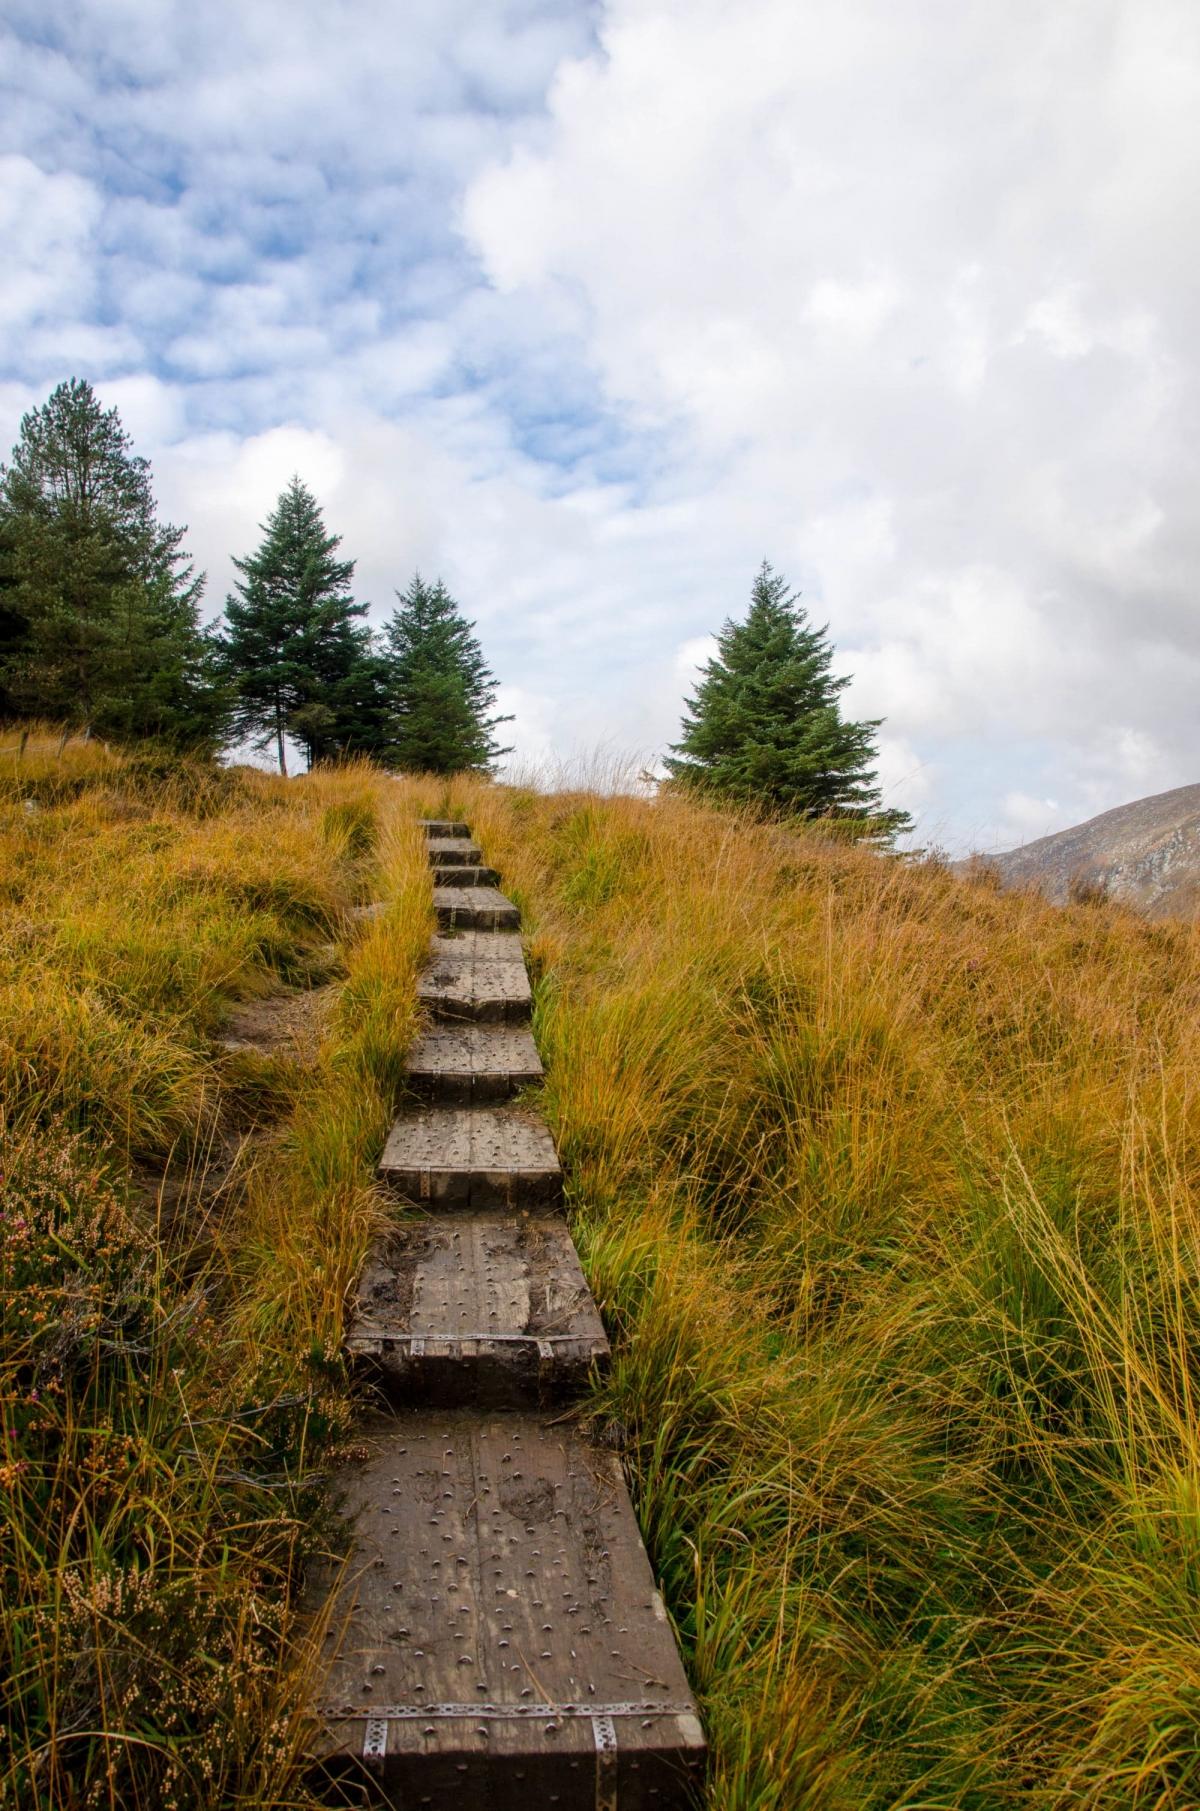 Gorgeous Girl Hd Wallpaper Glendalough Ireland And Wicklow Mountains National Park